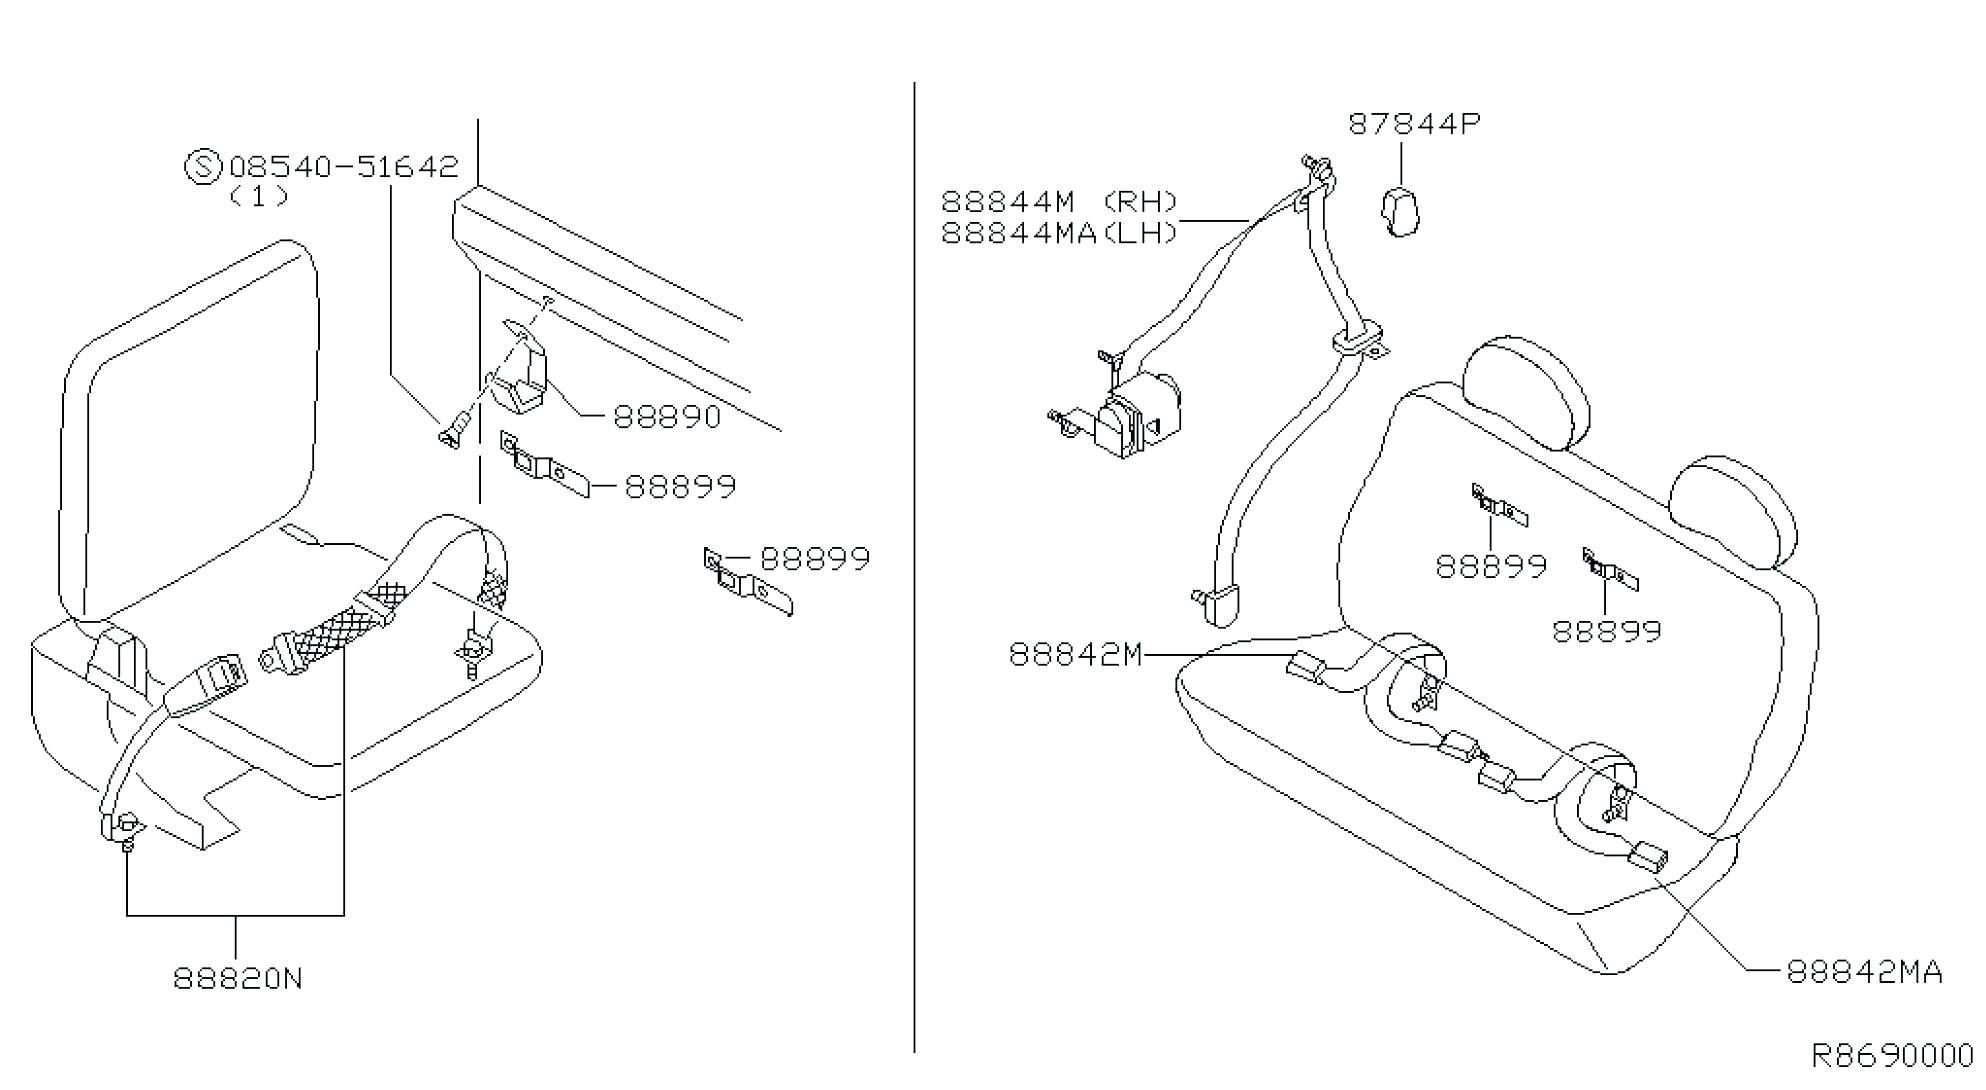 7mge toyota 3 0 engine diagram